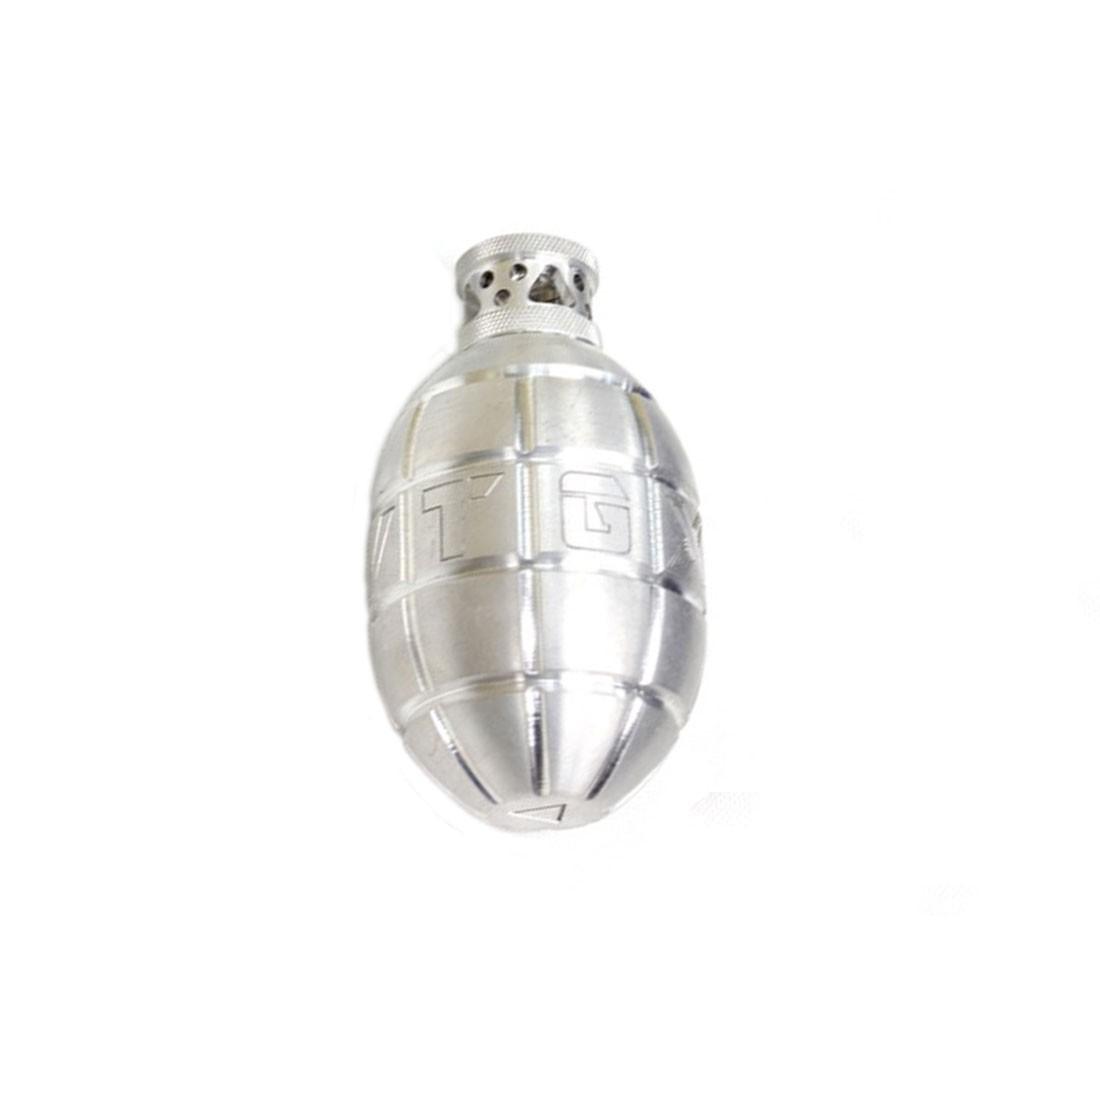 SWAT VTGX Versatile Training Grenade Blank Firing